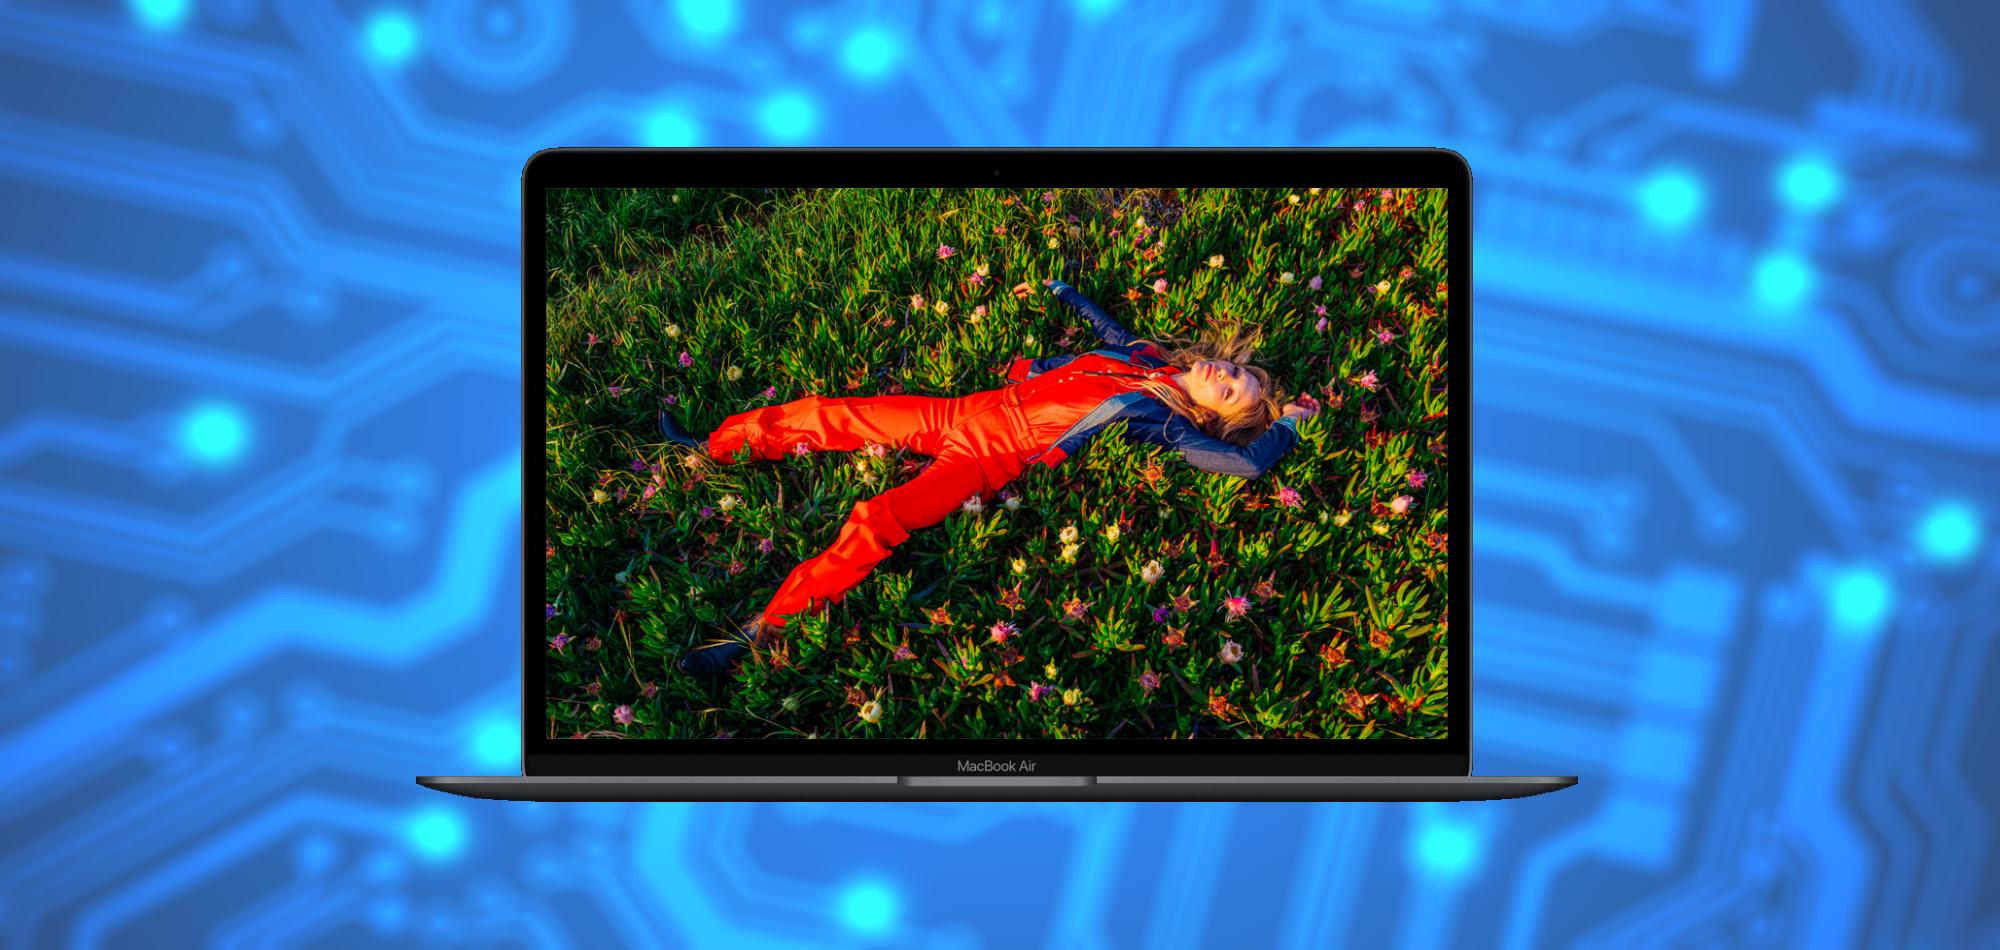 apple-macbook-pro-air-m1-ifixit-naprawa-notebook-procesor